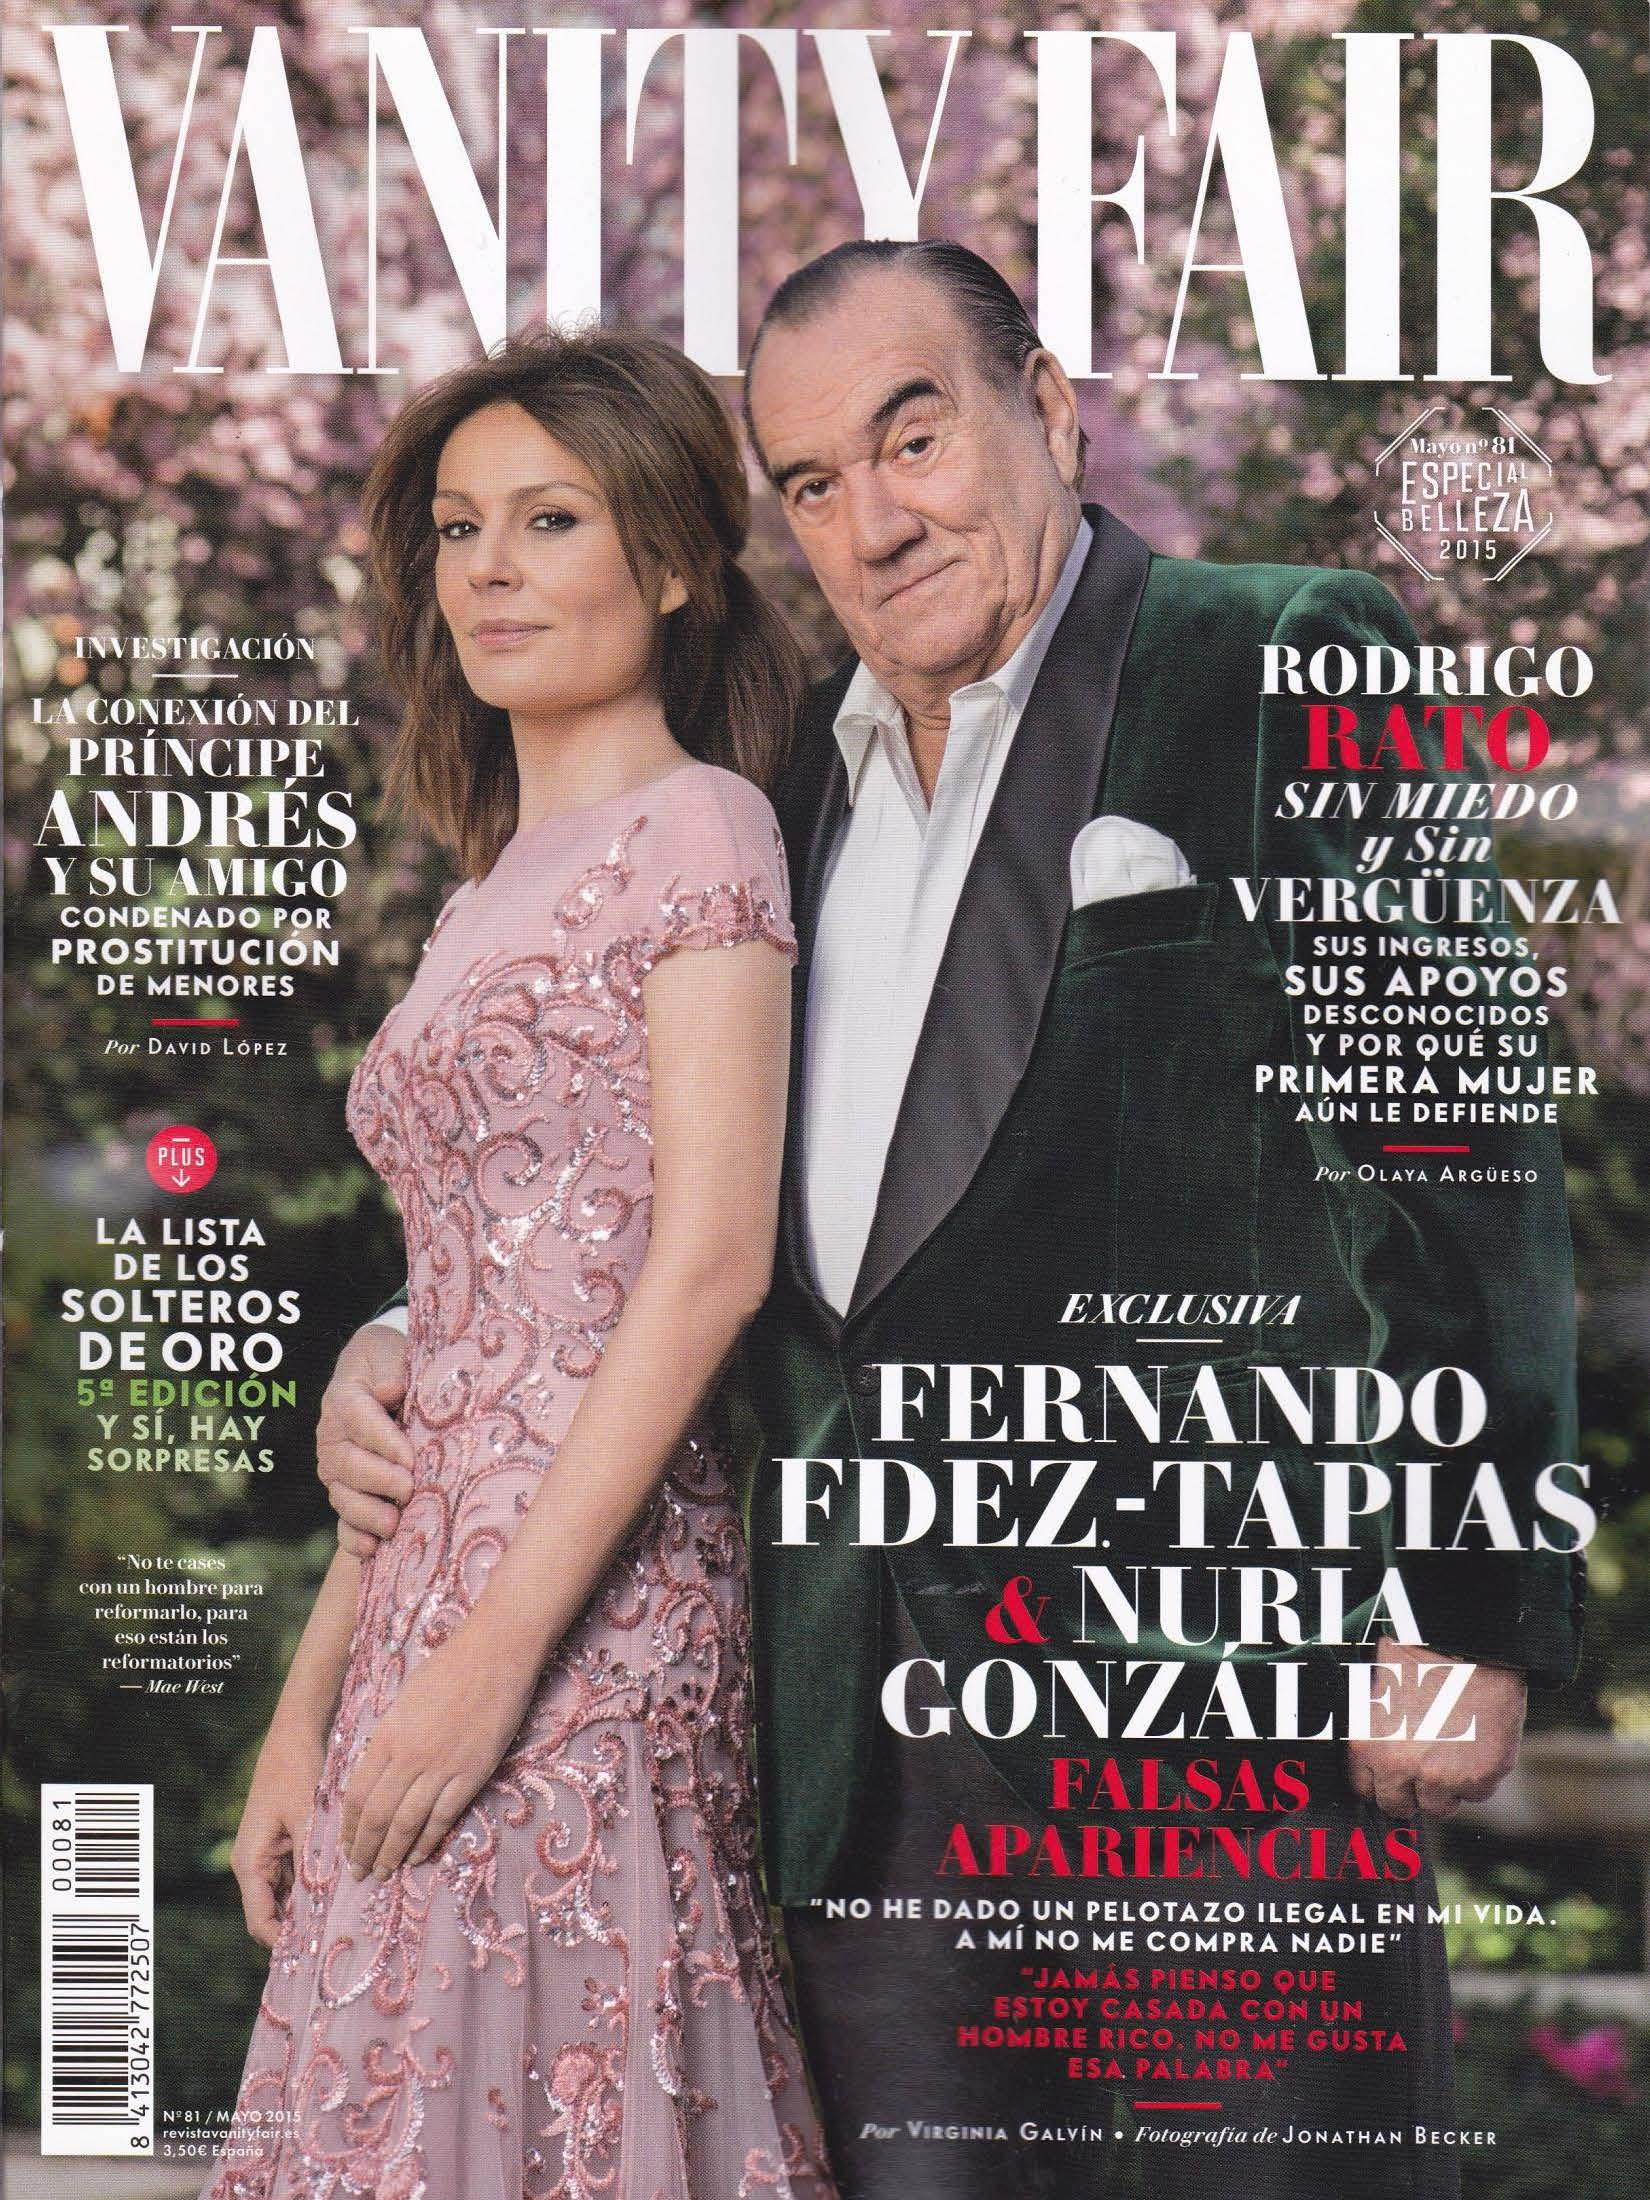 Margherita Missoni utilise la crème ULTRARICH DREAM Ami Iyök (Vanity Fair Espagne) VANITY-FAIR-mayo-2015-Ami-Iyök_Page_1